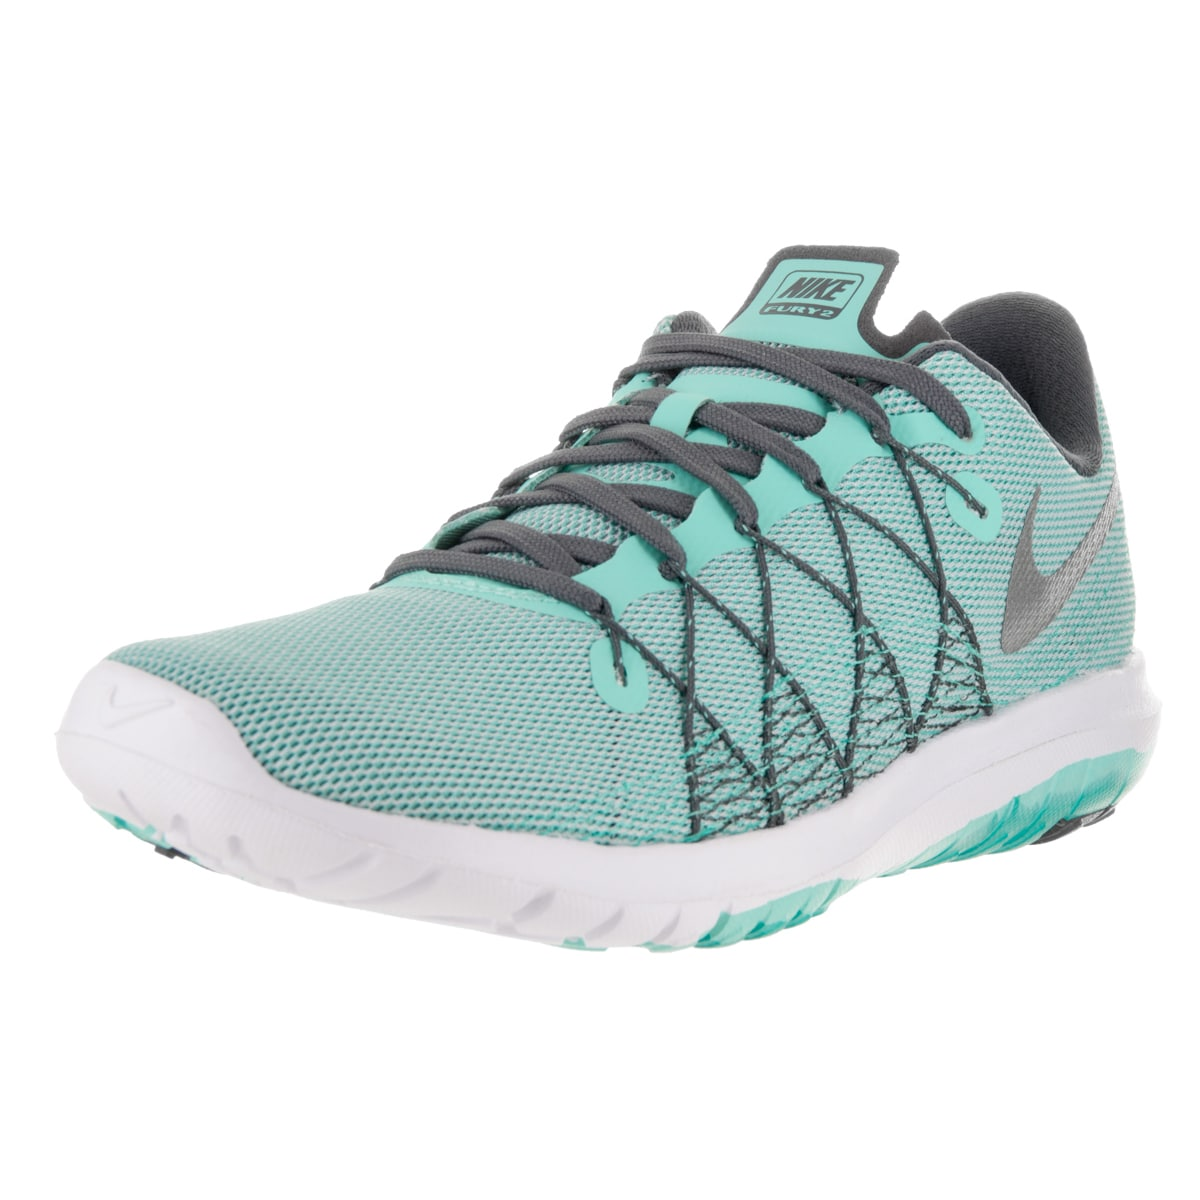 04110d84b2a75 Shop Nike Women s Flex Fury 2 Hyper Turquoise